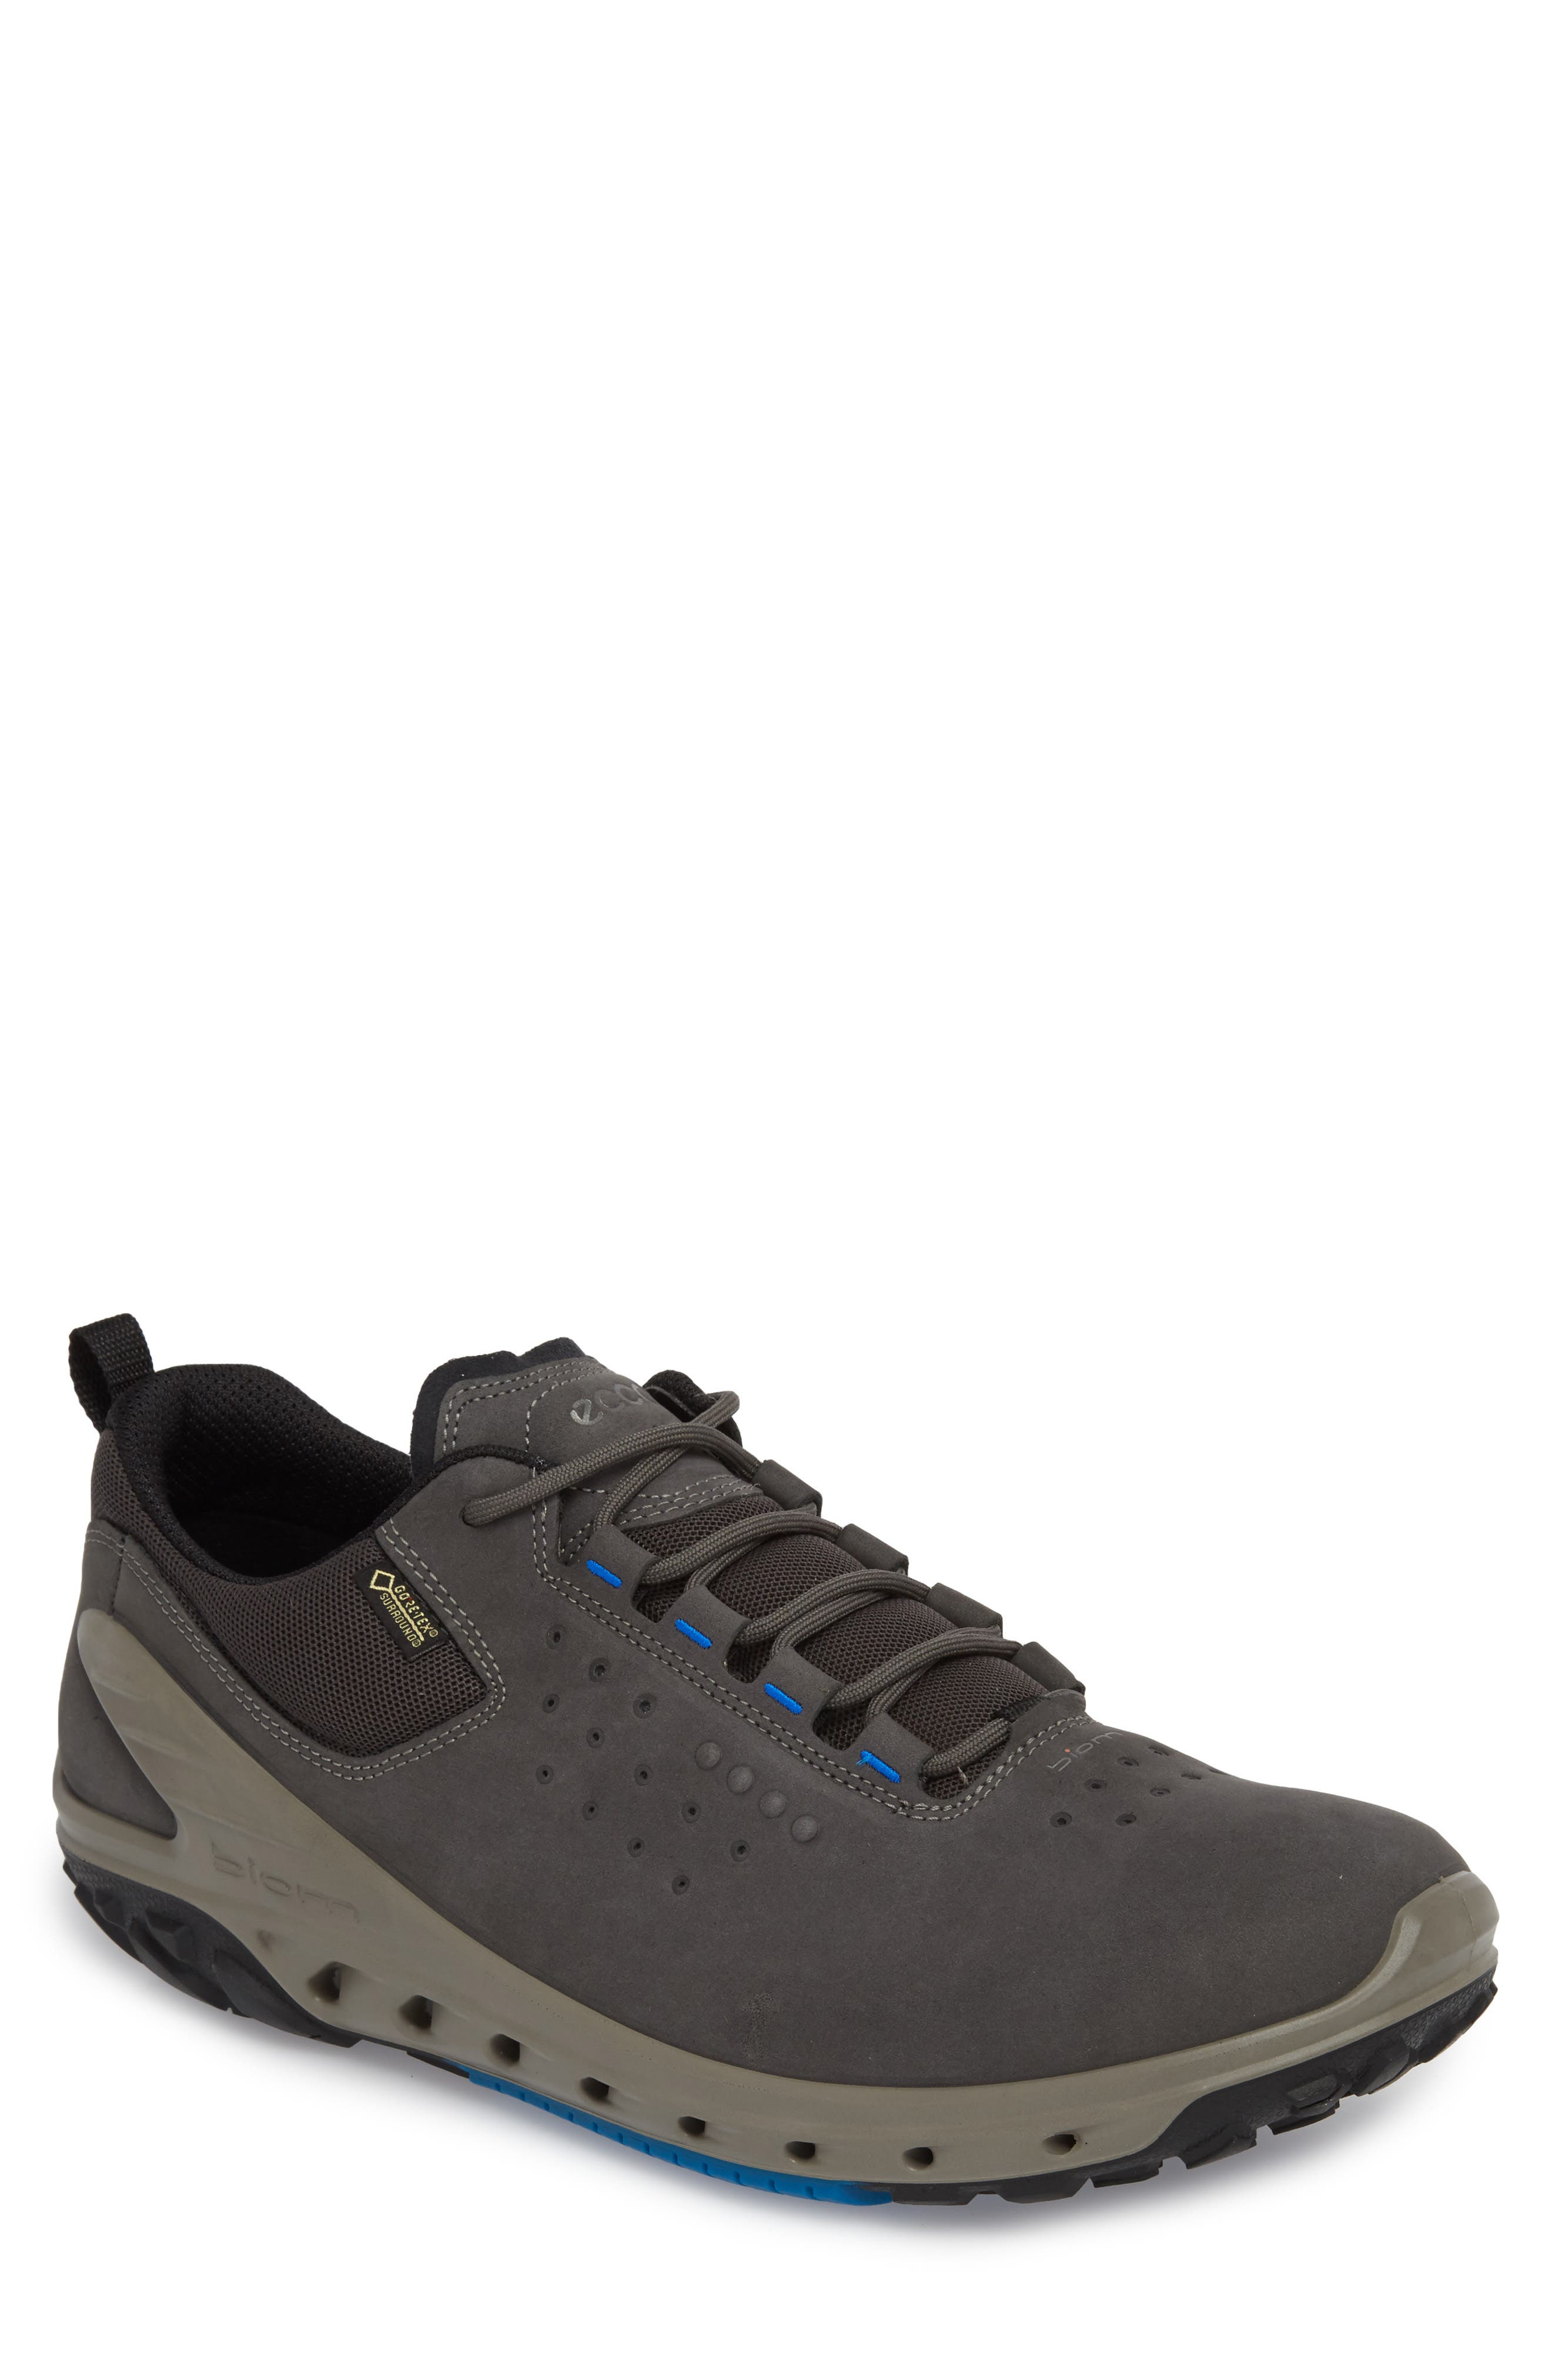 Biom Venture GTX Sneaker,                         Main,                         color,